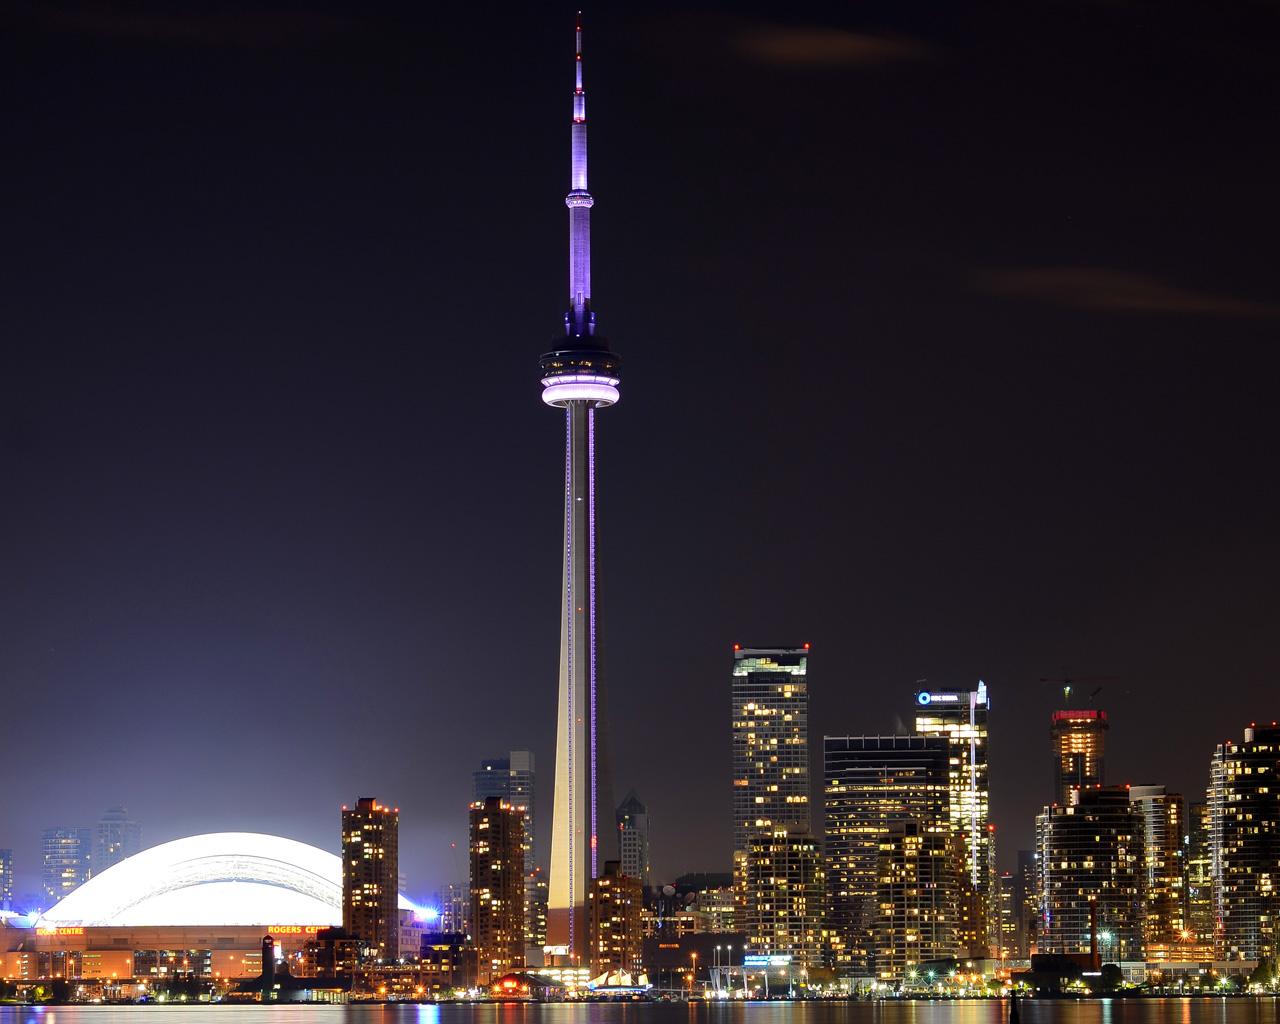 Toronto CN Tower At Night Wallpaper 1280x1024